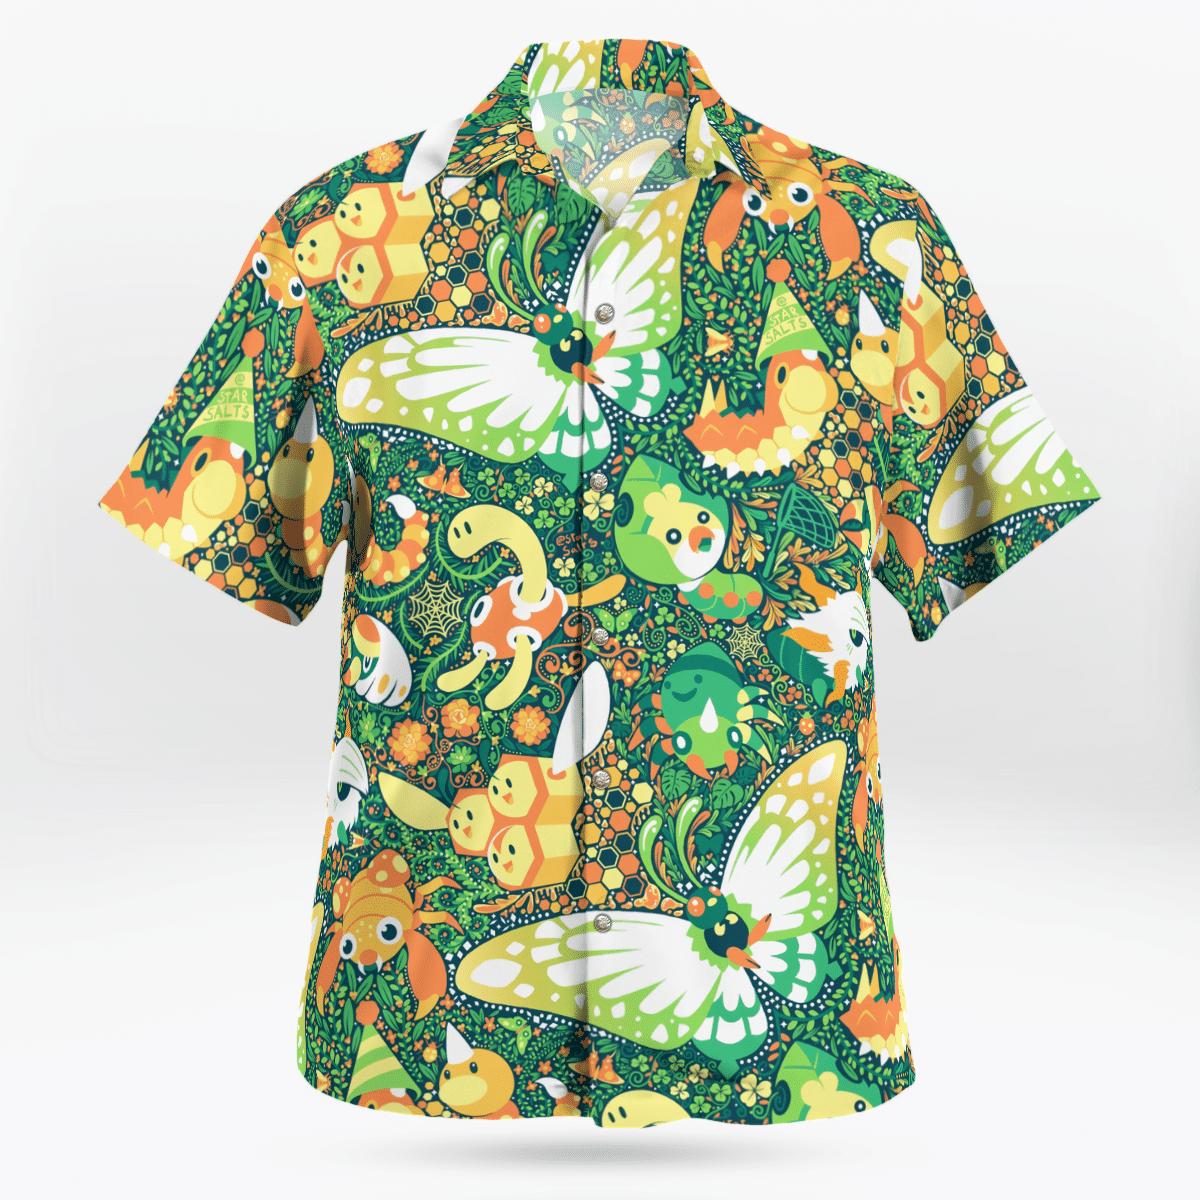 Bug Pokemon Hawaiian shirt - LIMITED EDITION